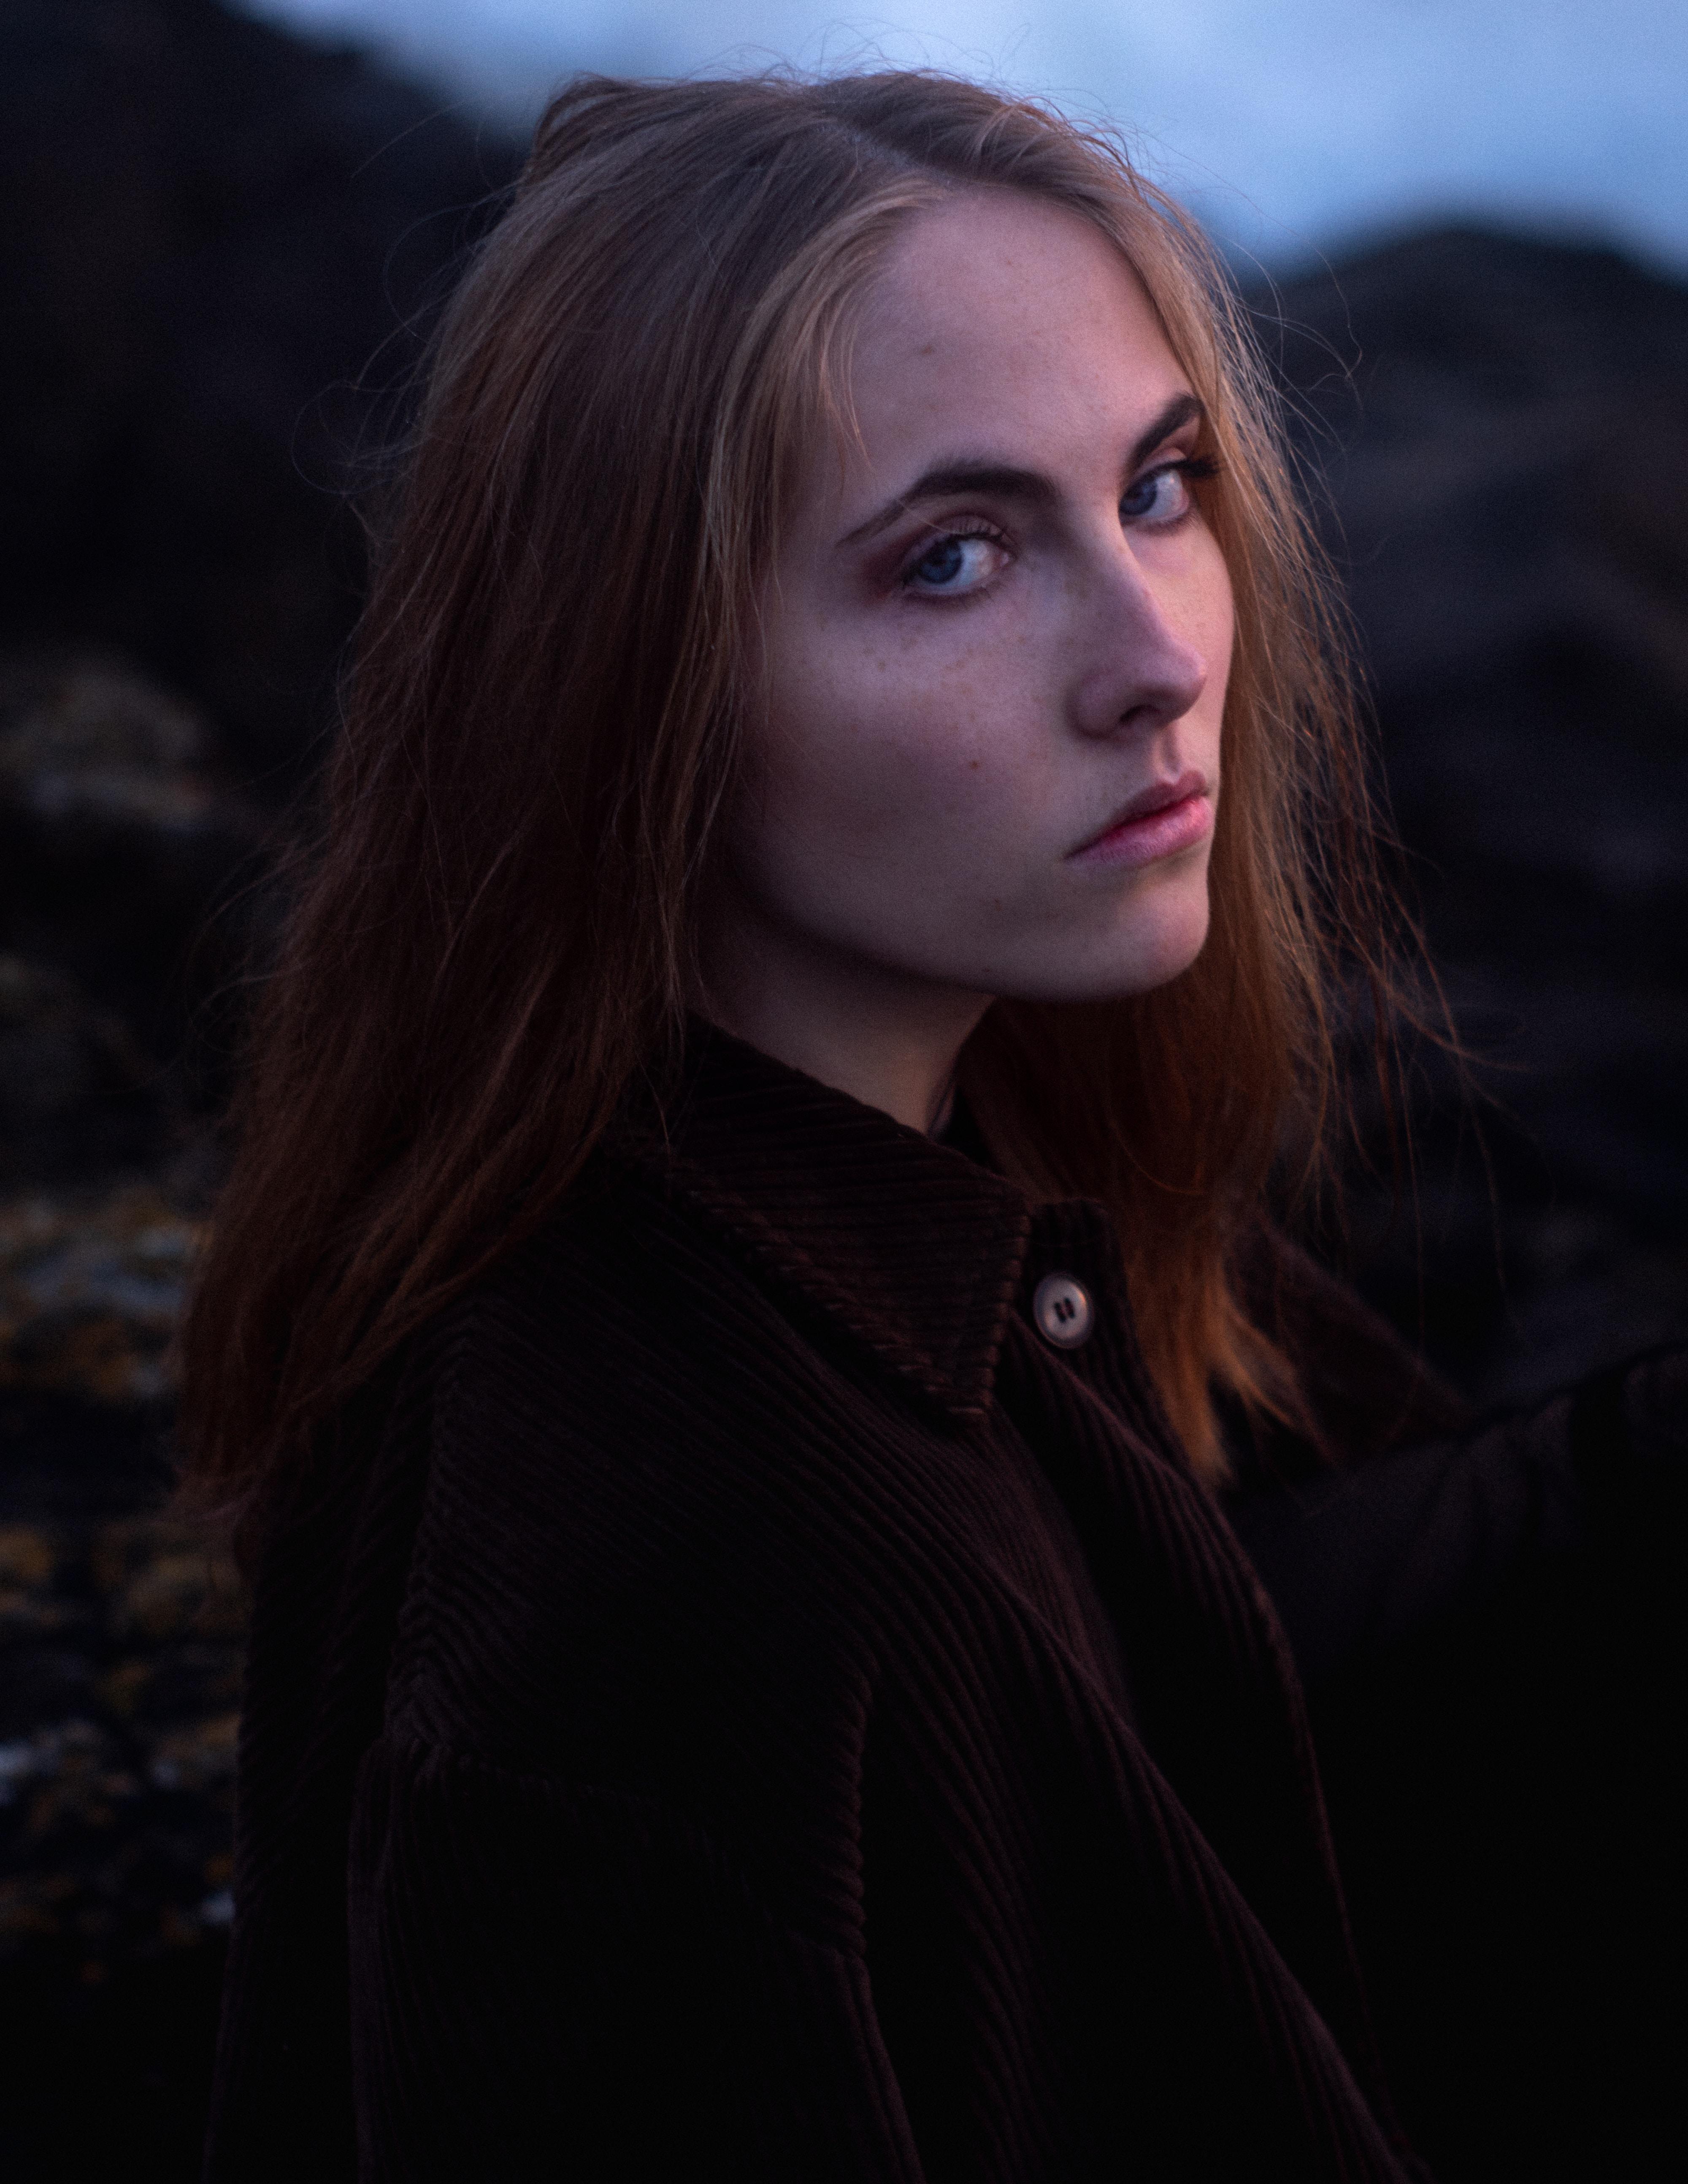 woman in black collared top